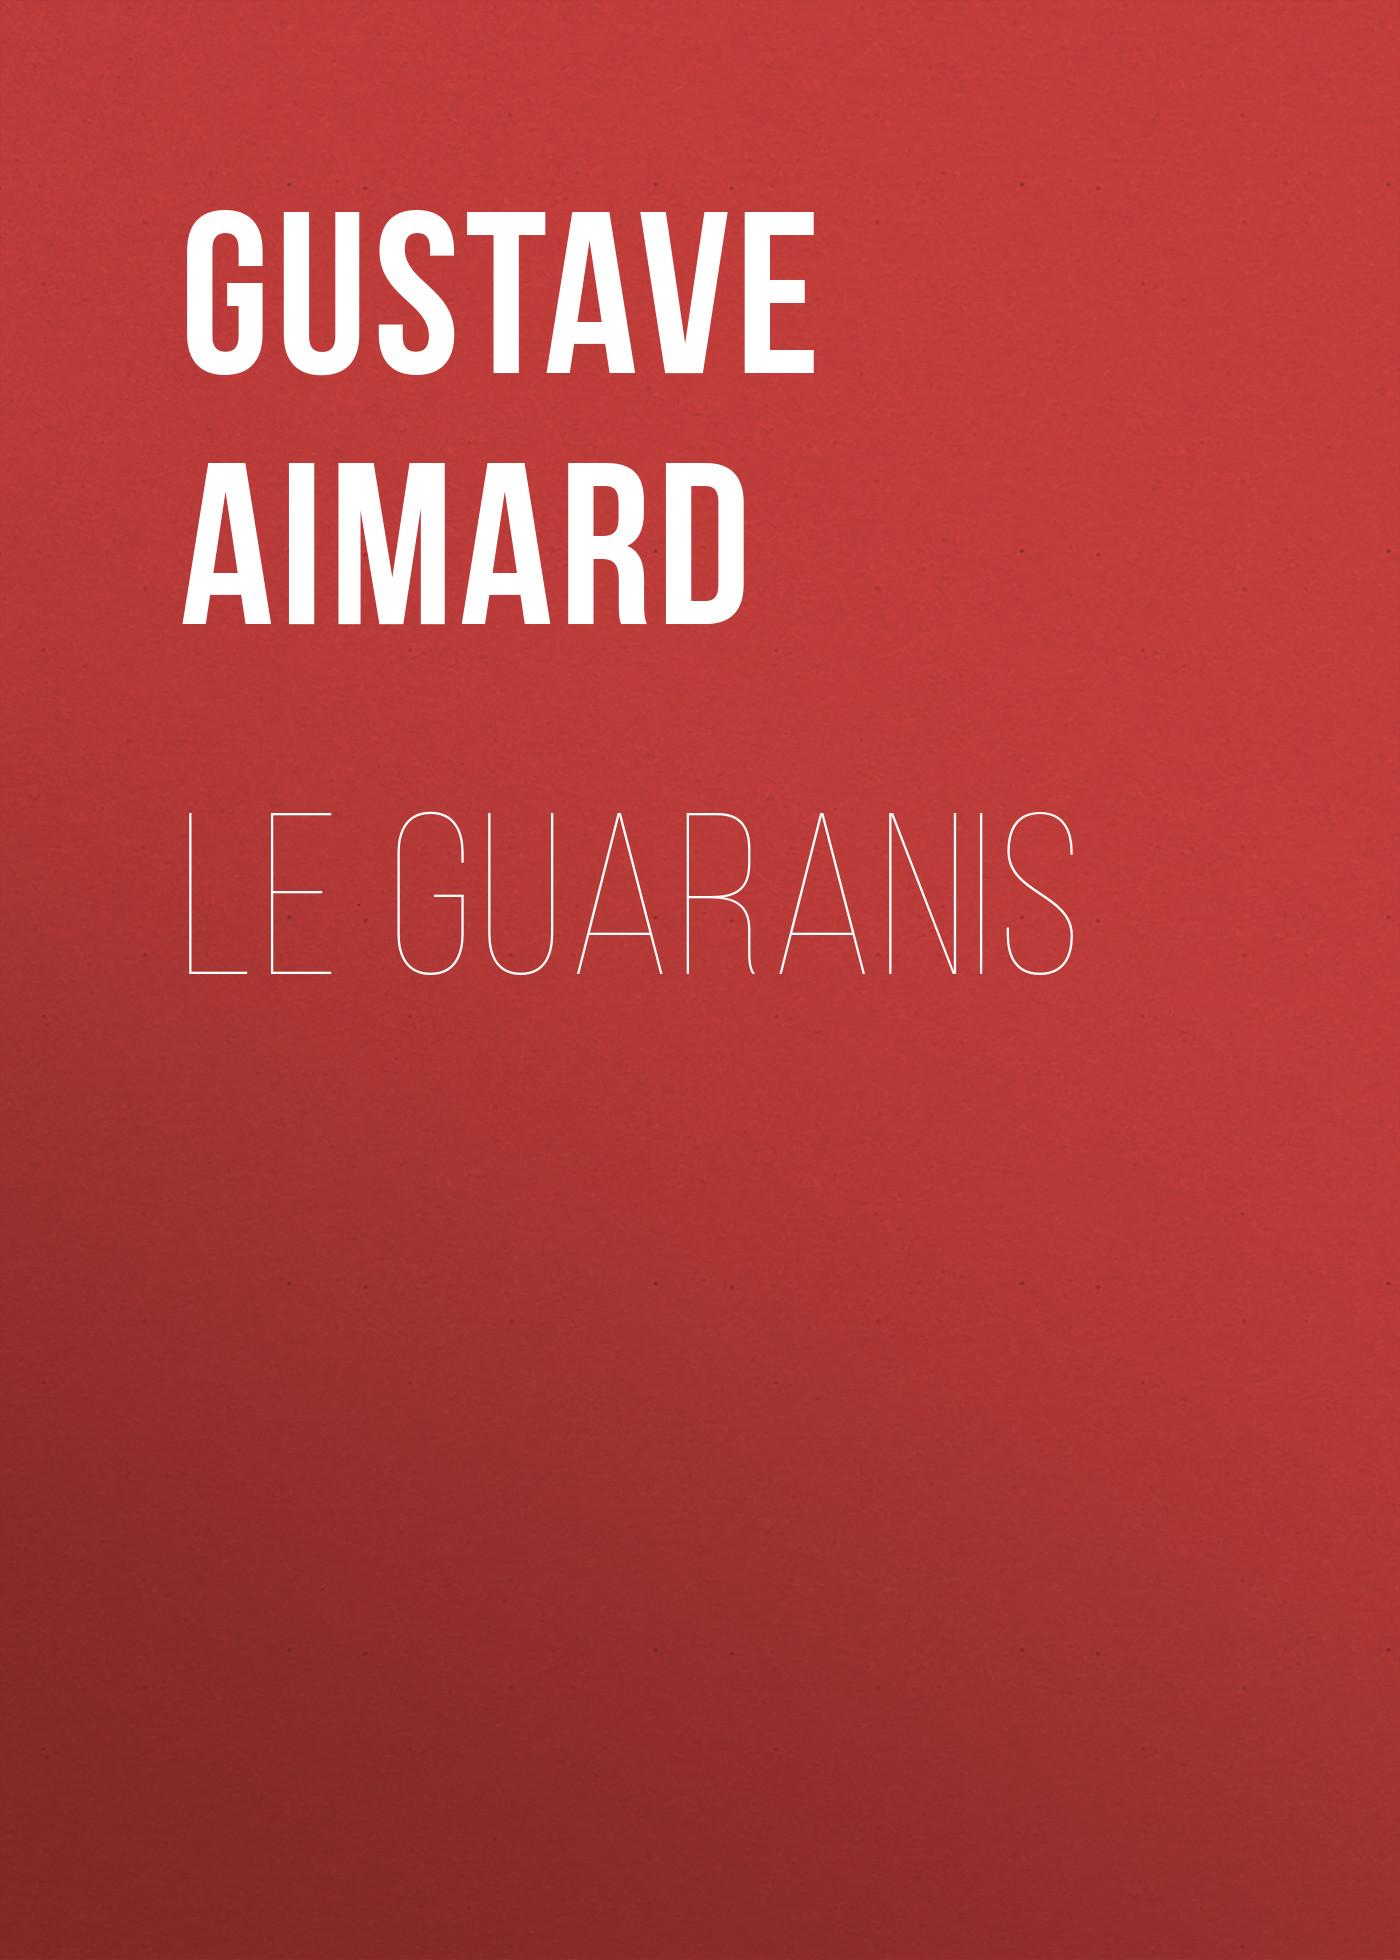 Gustave Aimard Le Guaranis